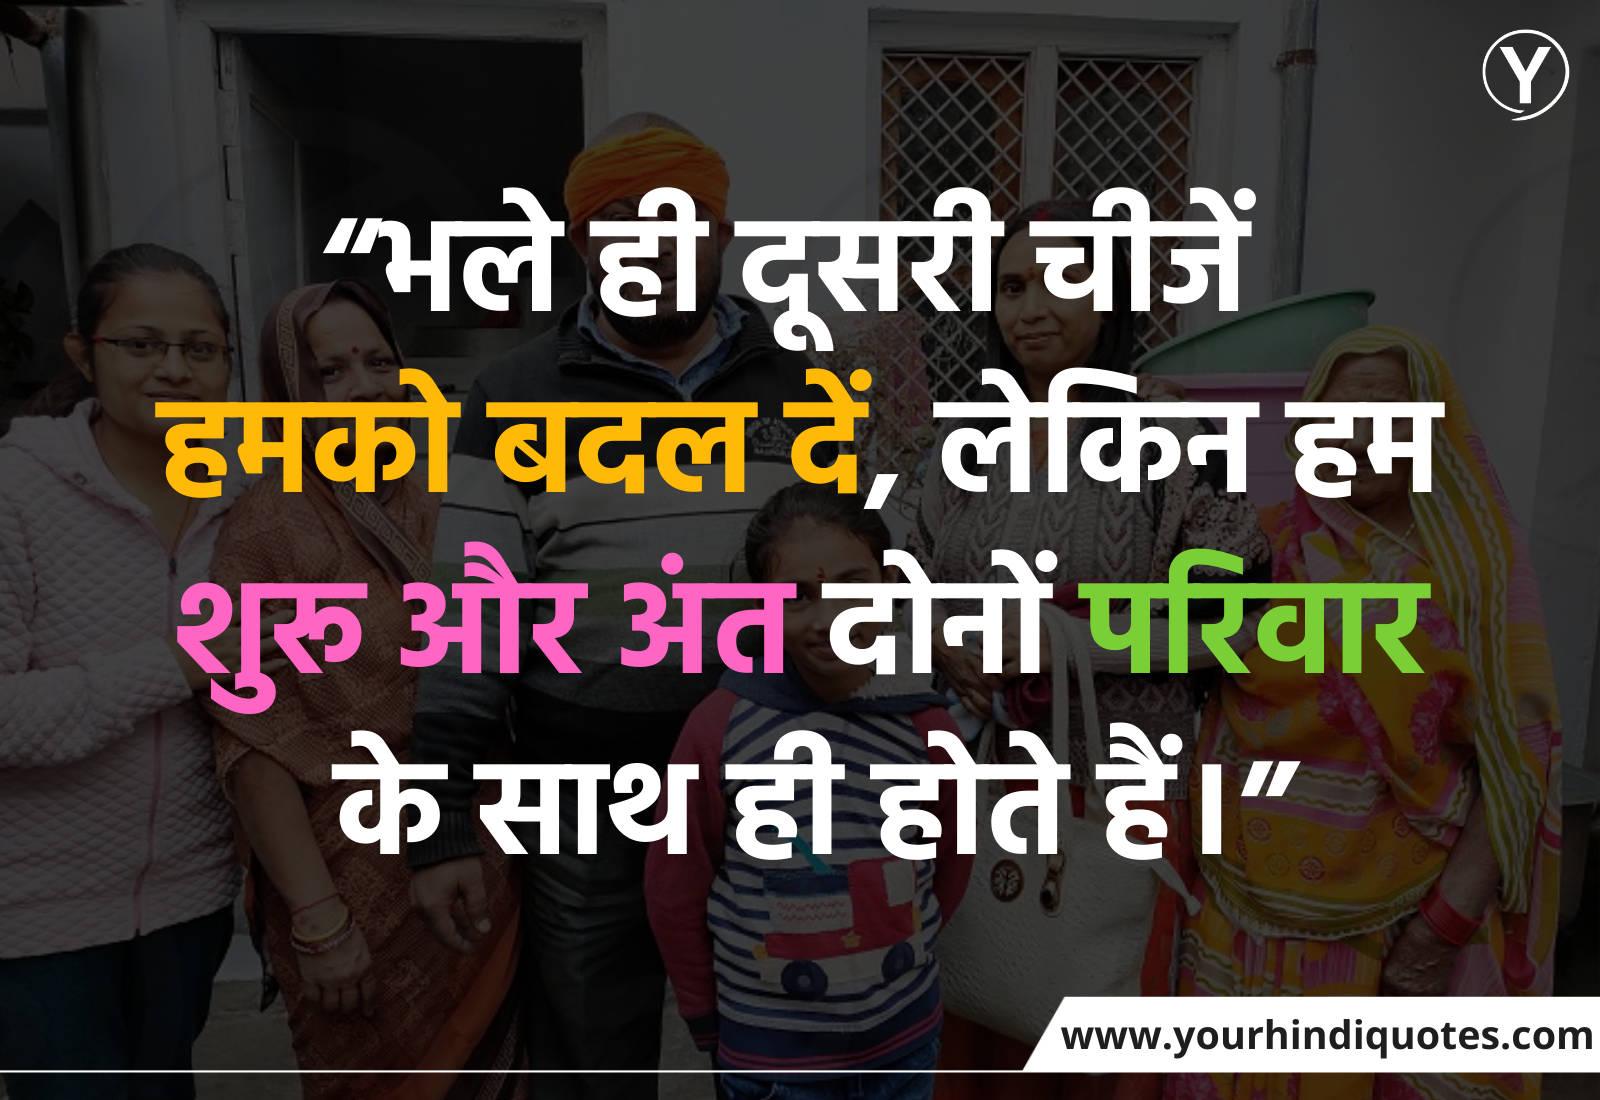 Parivar Family Quotes